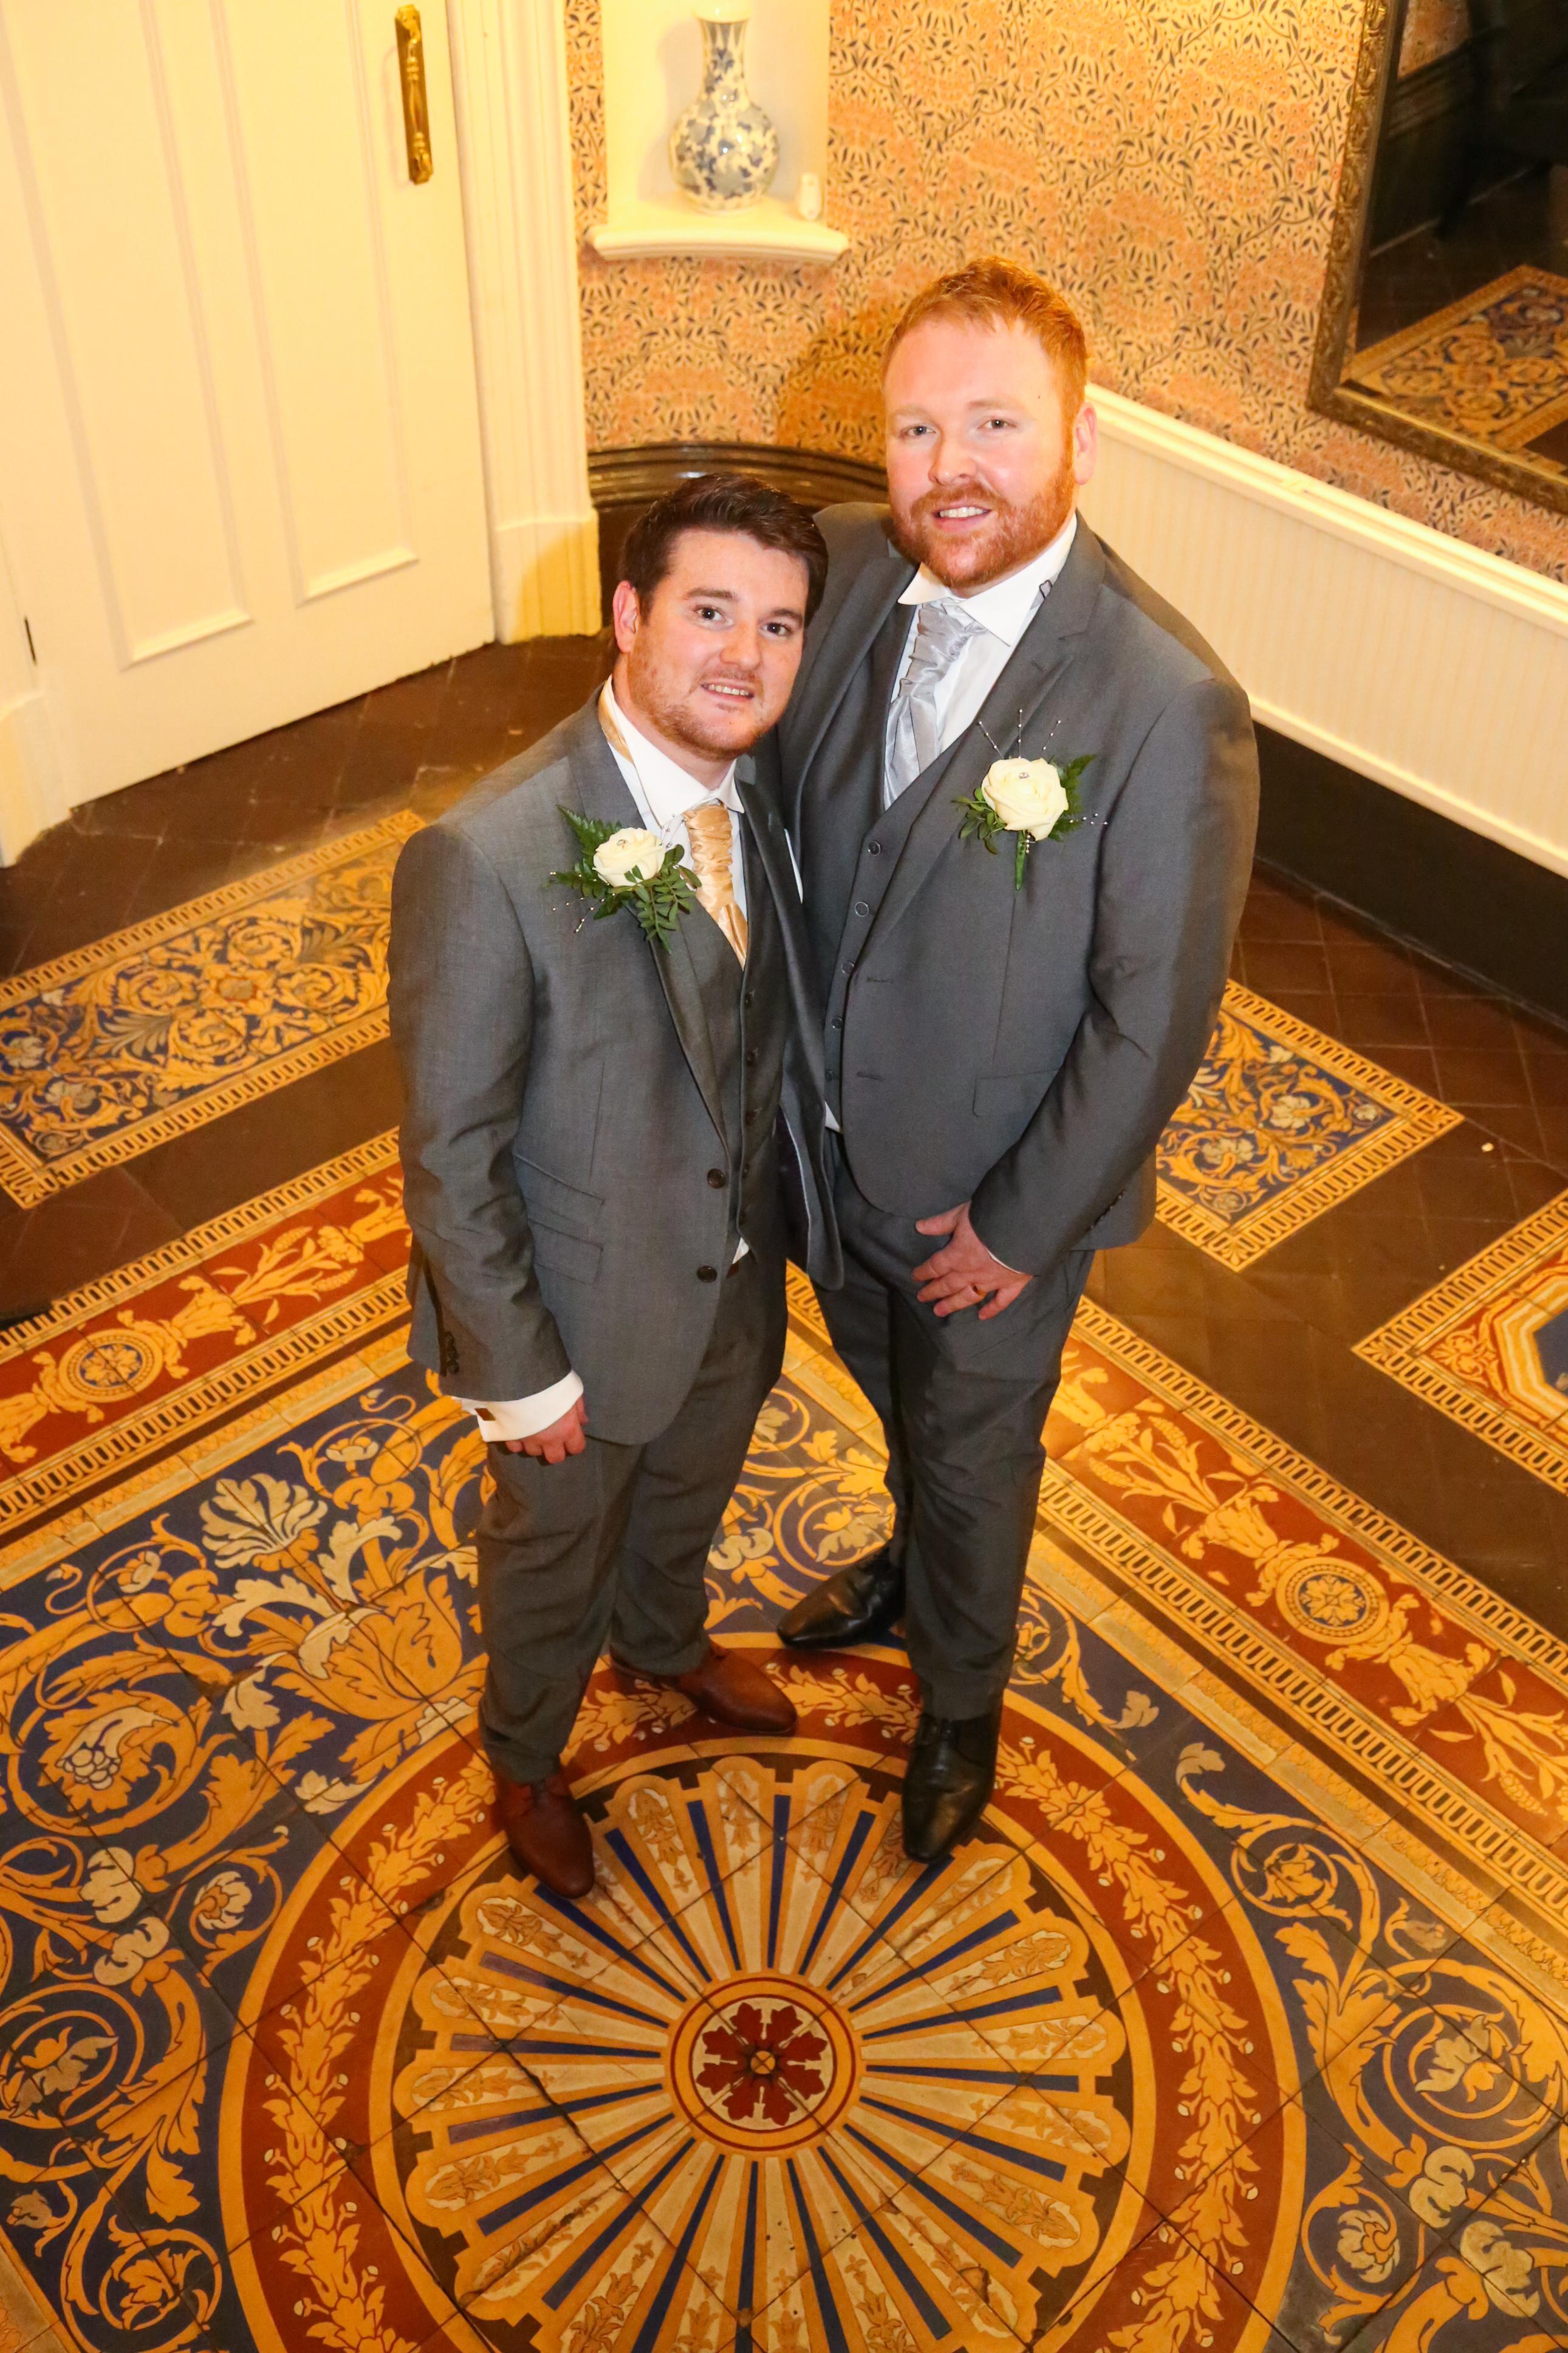 Micheal and Gareth